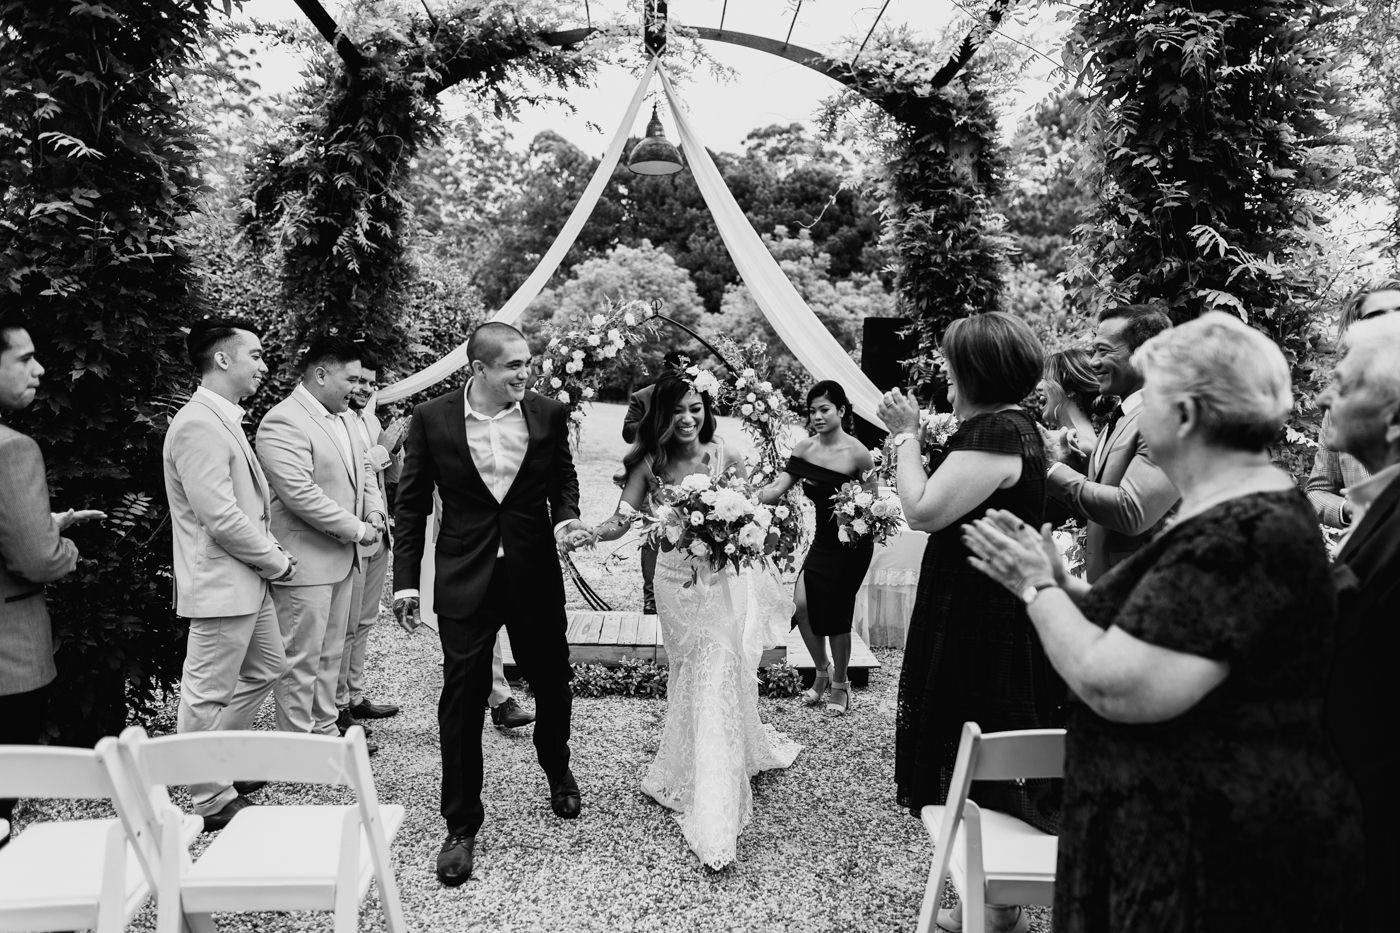 Nick & Vanezza - Fernbank Farm Wedding - Samantha Heather Photography-82.jpg